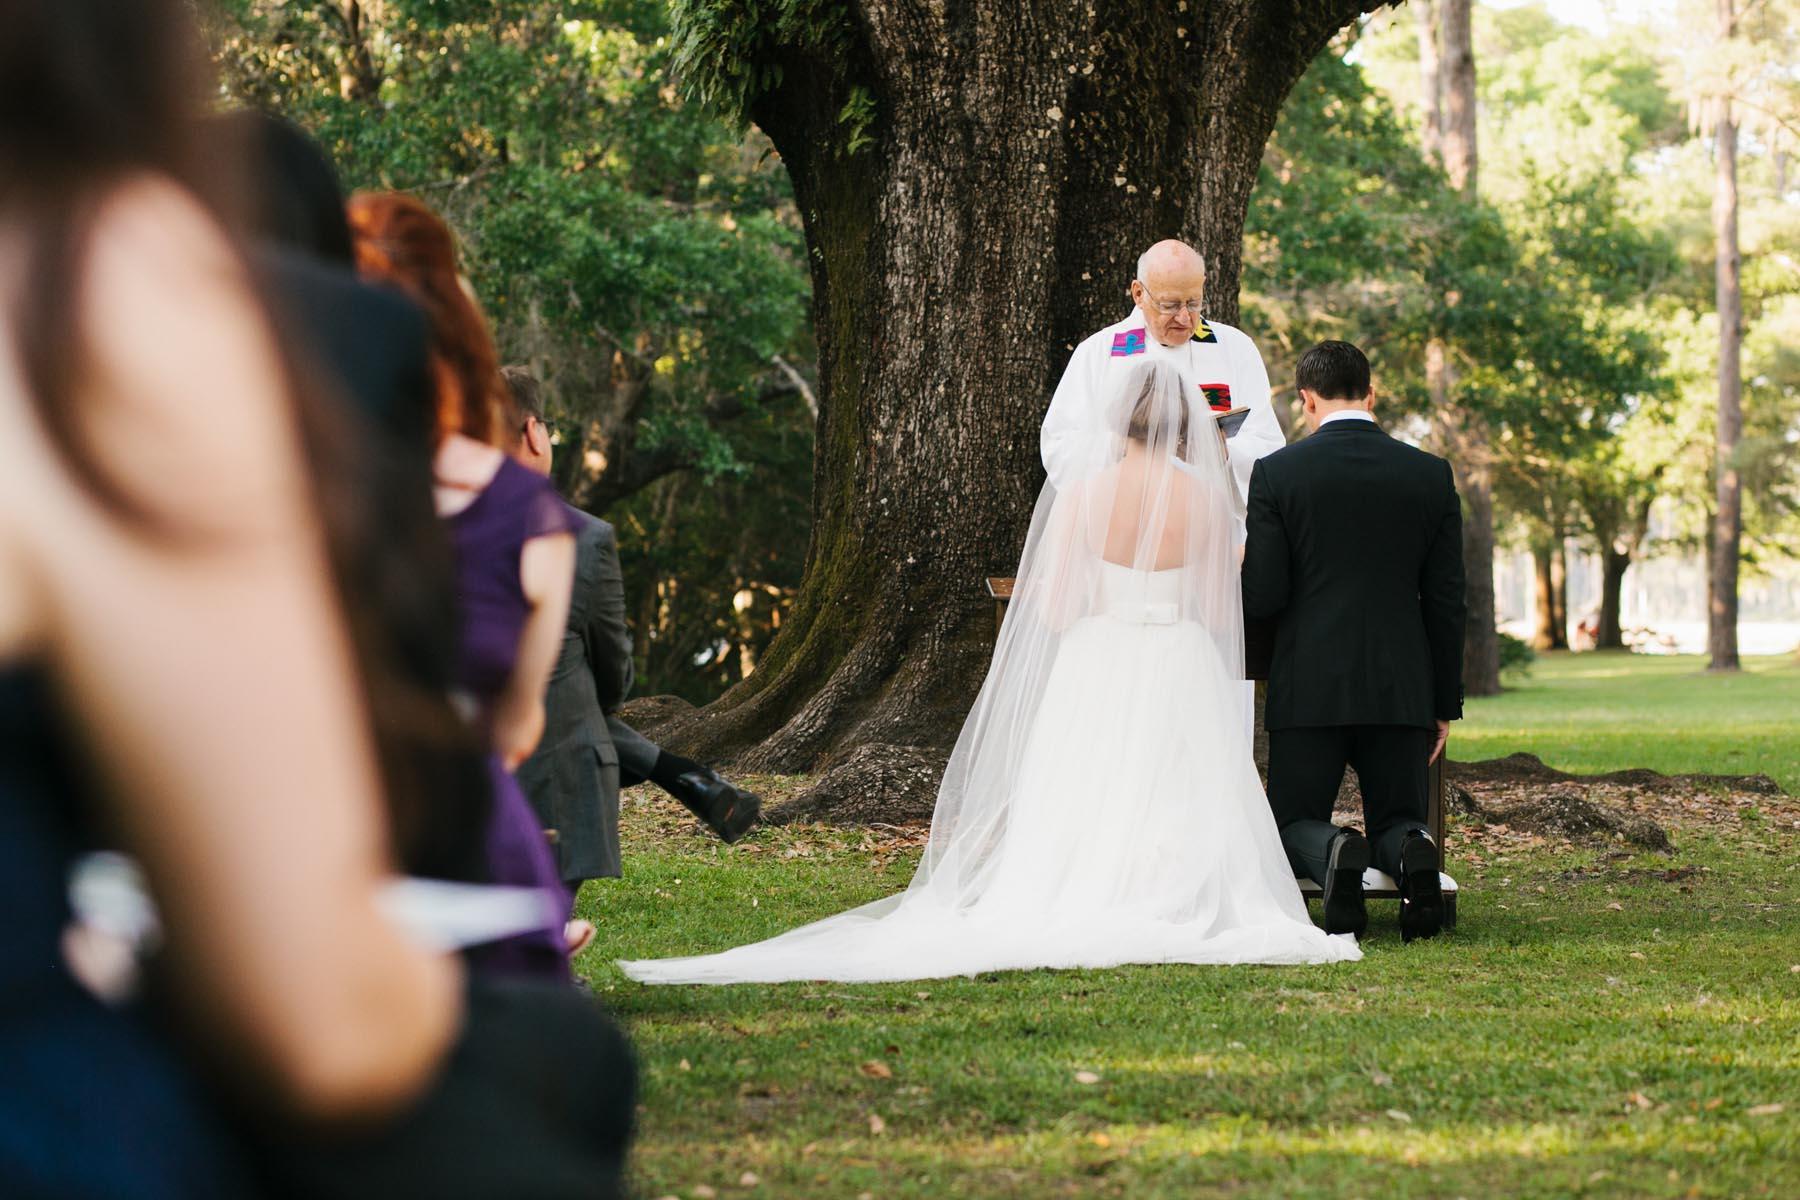 lowry wedding blog eden garden florida wedding-69